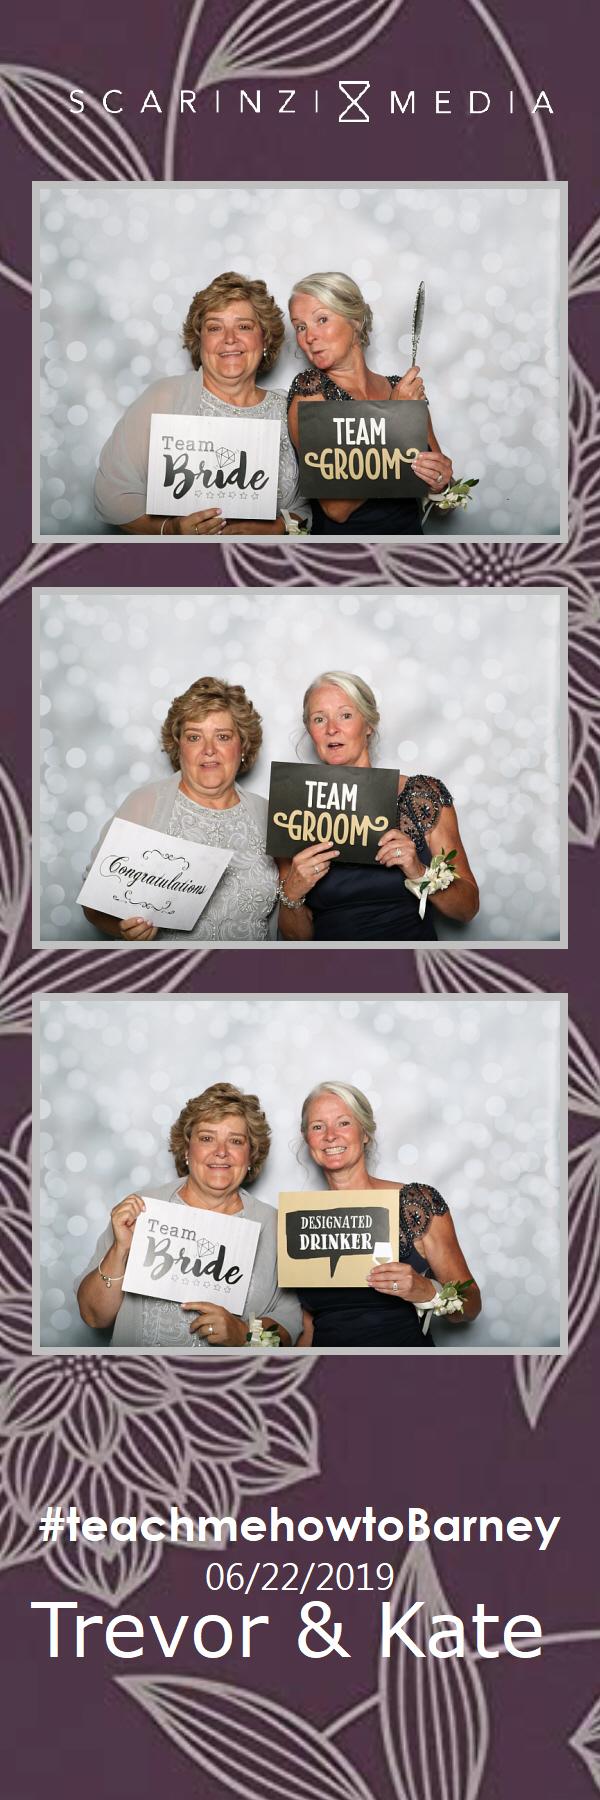 2019.06.22 - Barney Wedding PHOTOBOOTH04.jpg